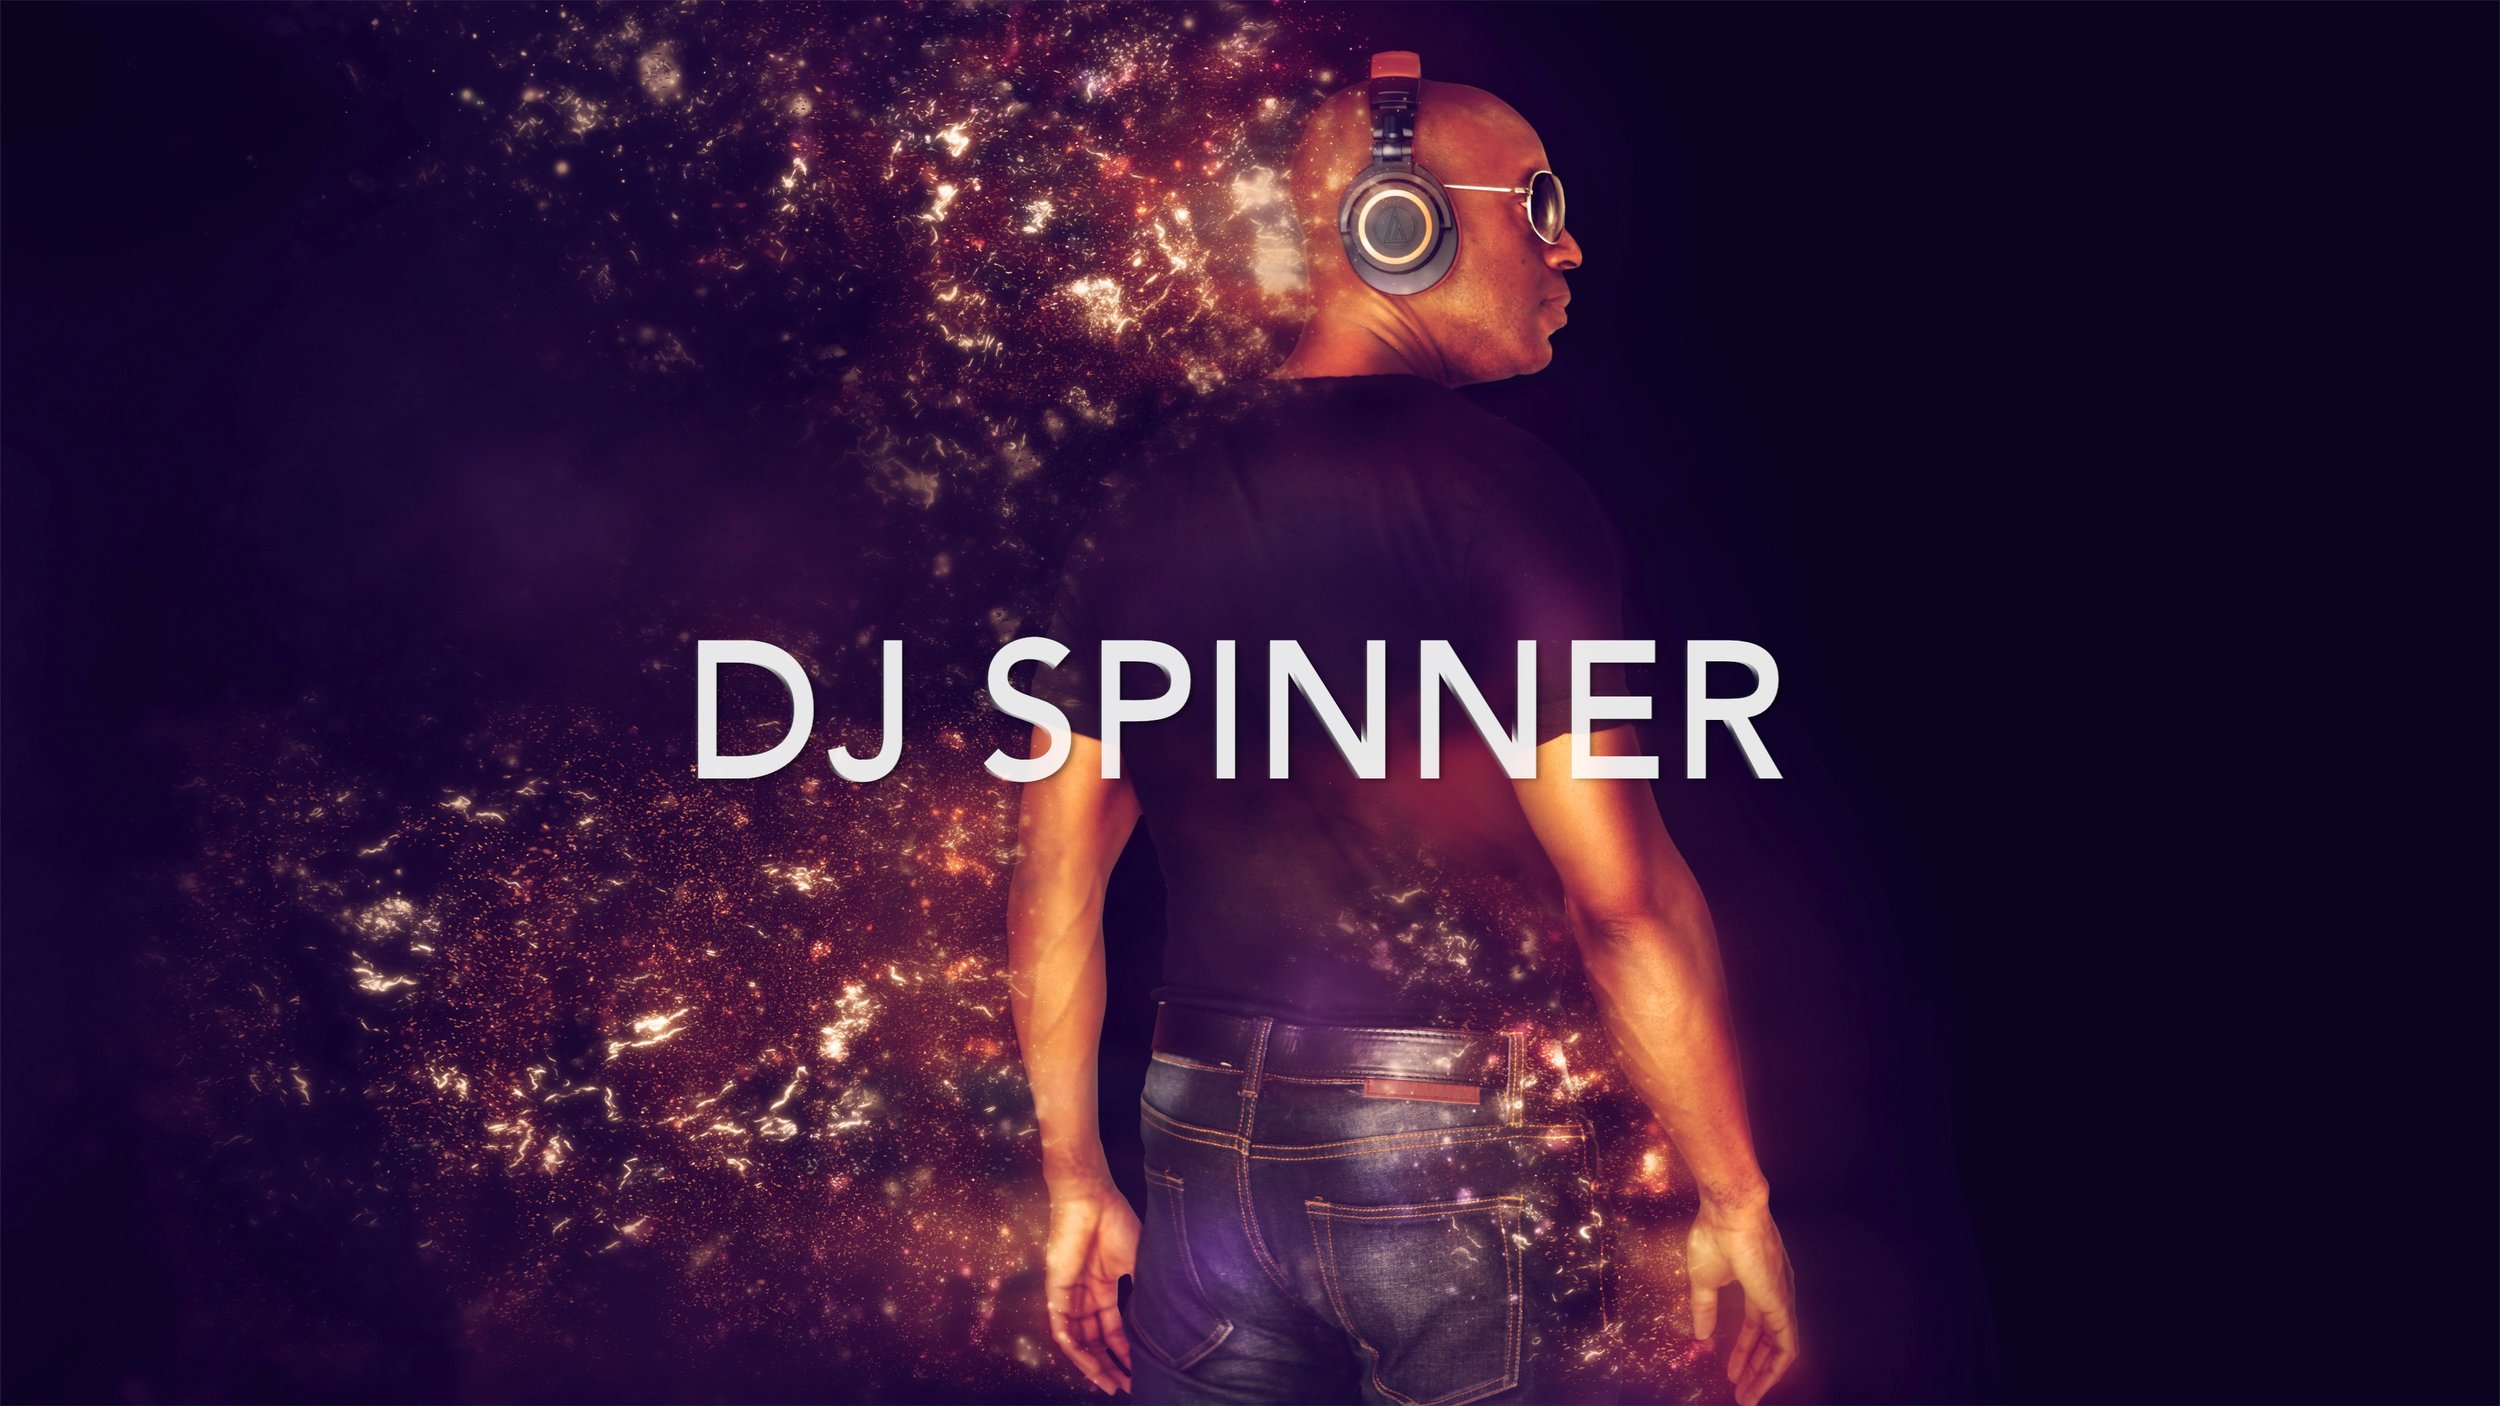 DJ6_ONQ_DJ_SPINNER.jpg